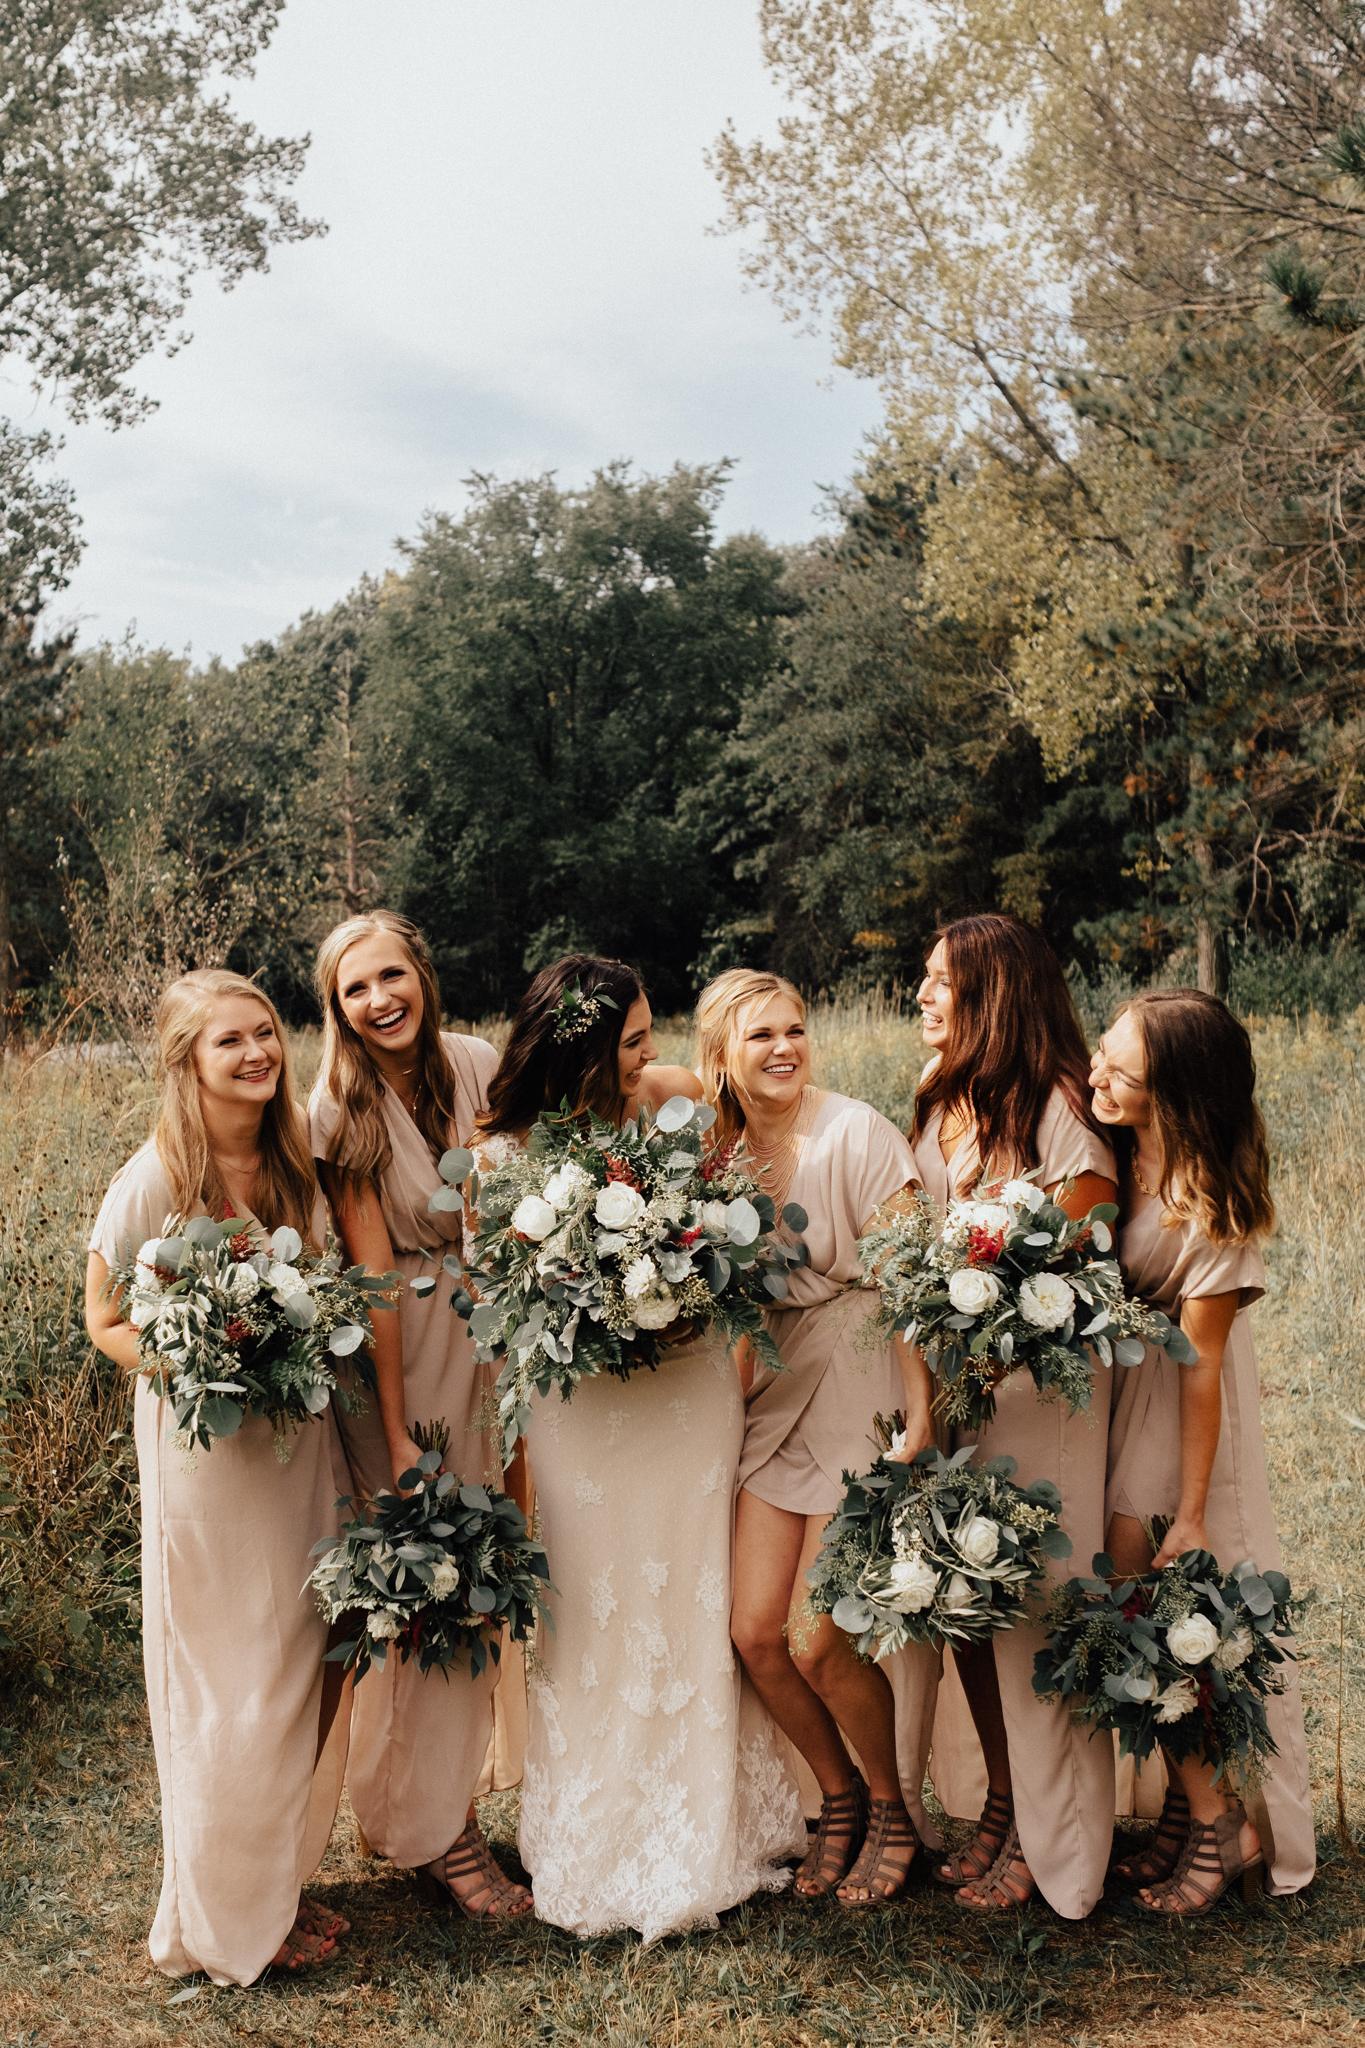 Arizona-Adventure-Elopement-Wedding-Photographer-109.jpg